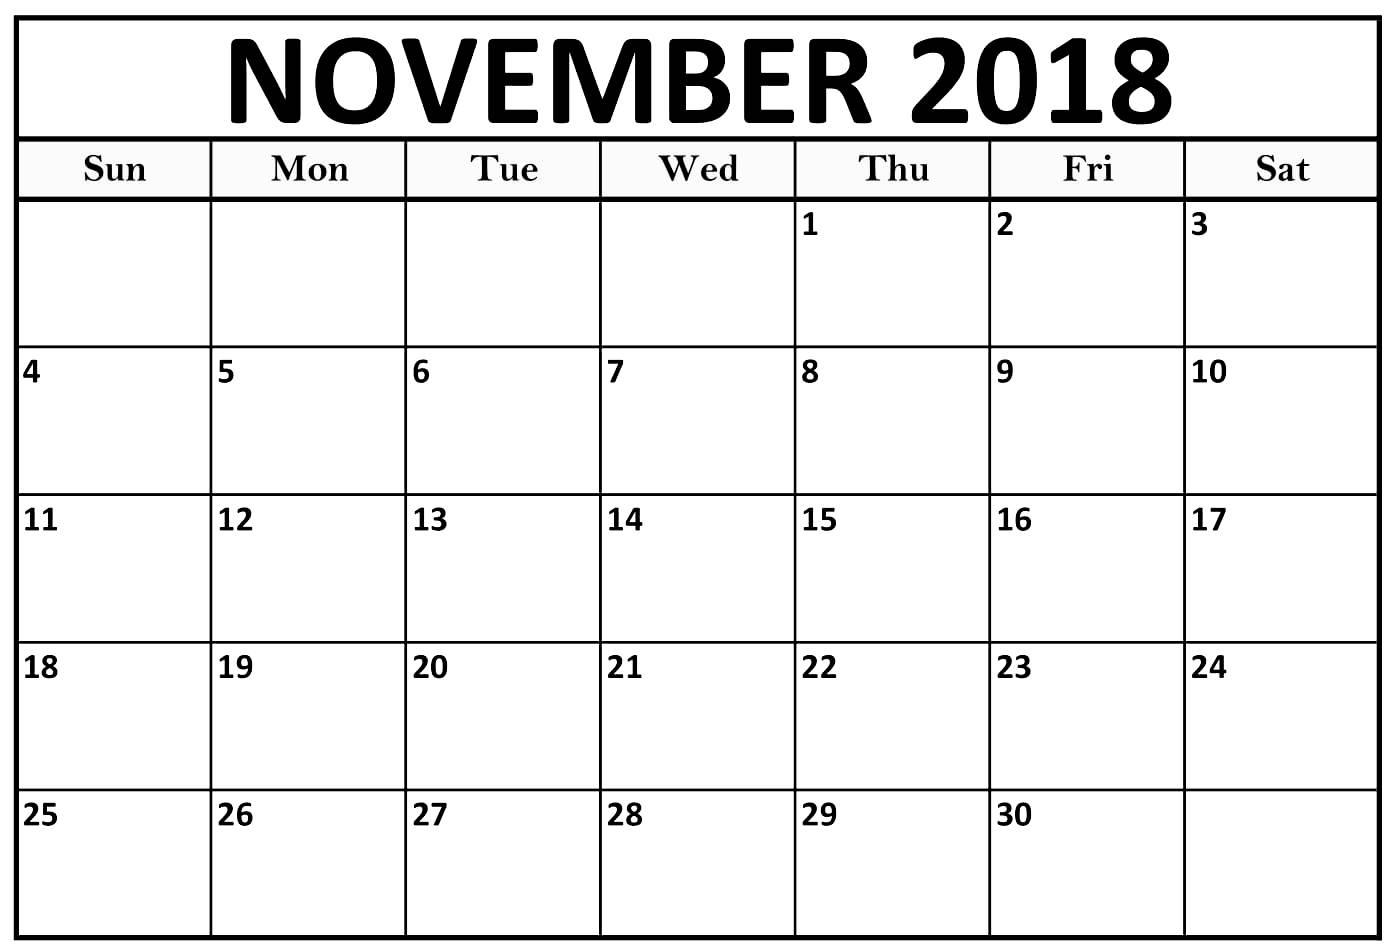 Print November 2018 Calendar Editable Templates